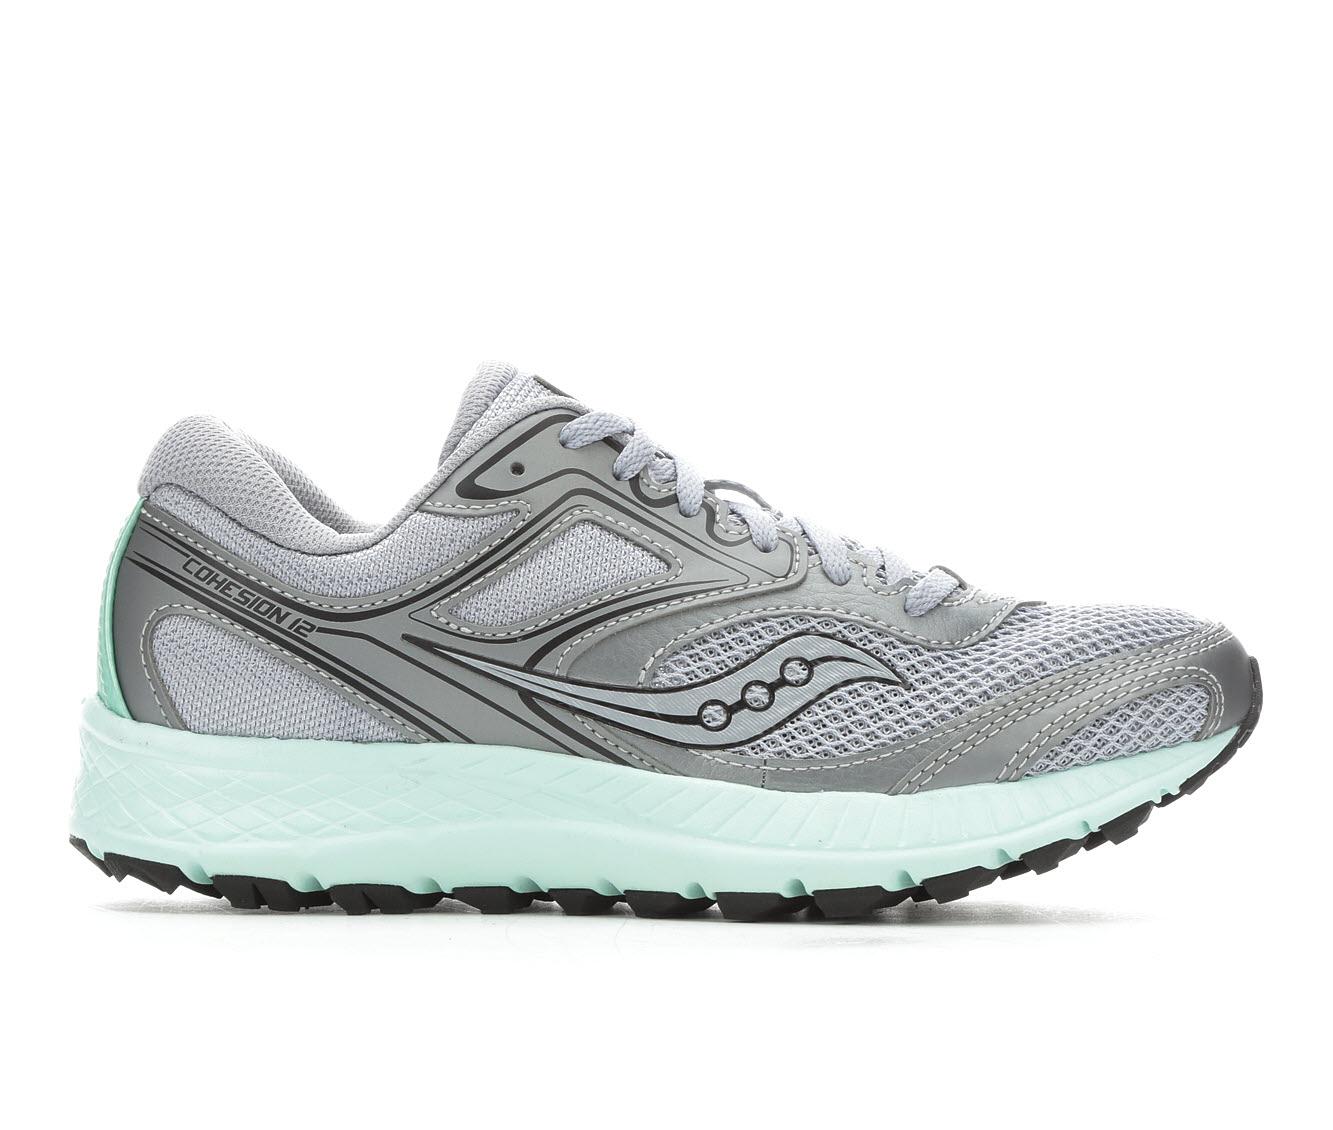 Saucony Cohesion TR 12 Women's Athletic Shoe (Gray)